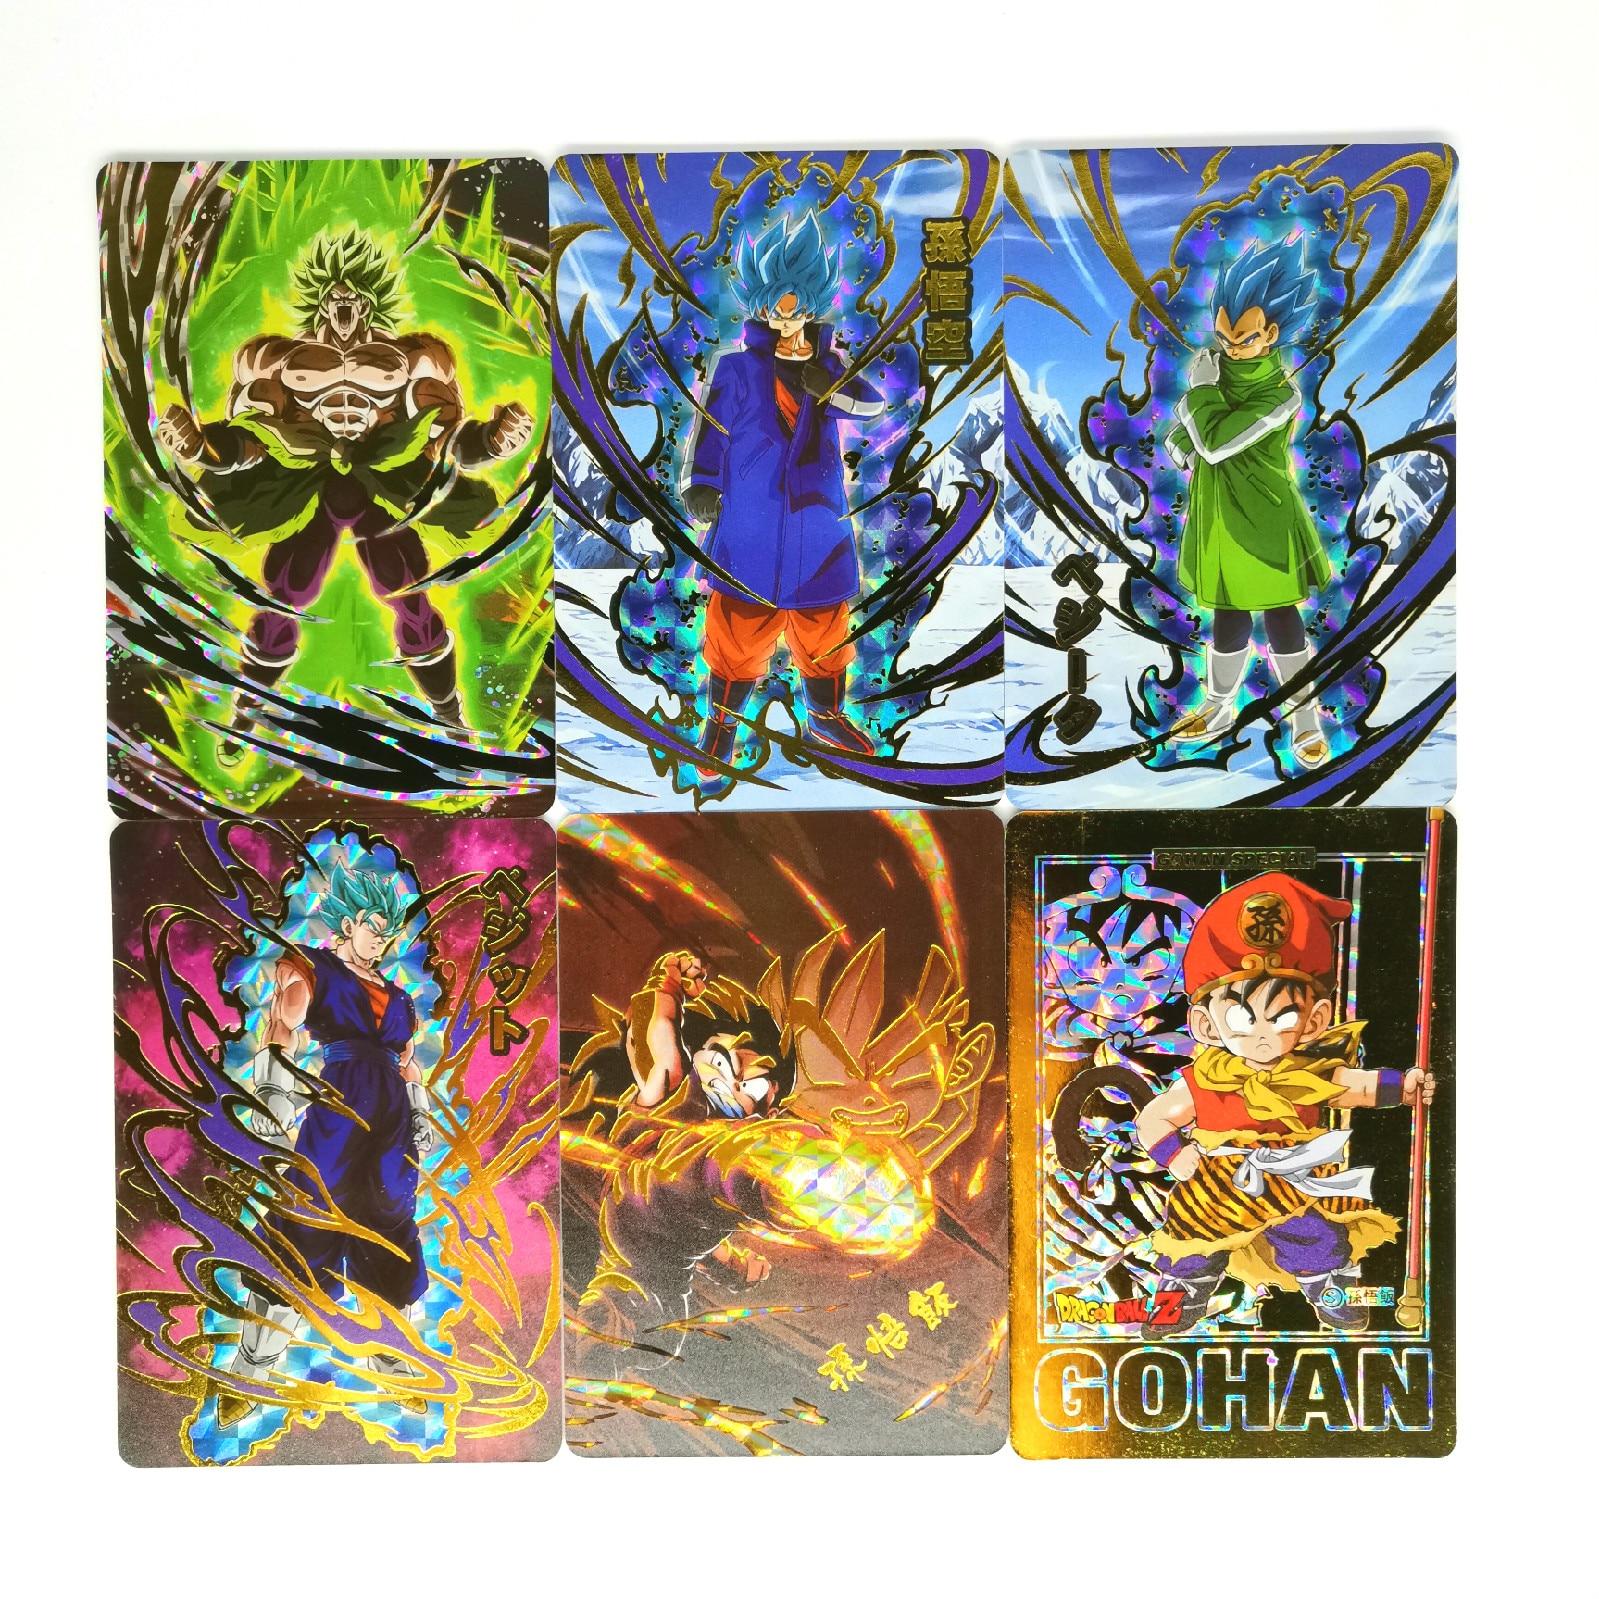 9pcs/set Super Dragon Ball Z Bronzing Heroes Battle Card Ultra Instinct Goku Vegeta Game Collection Cards